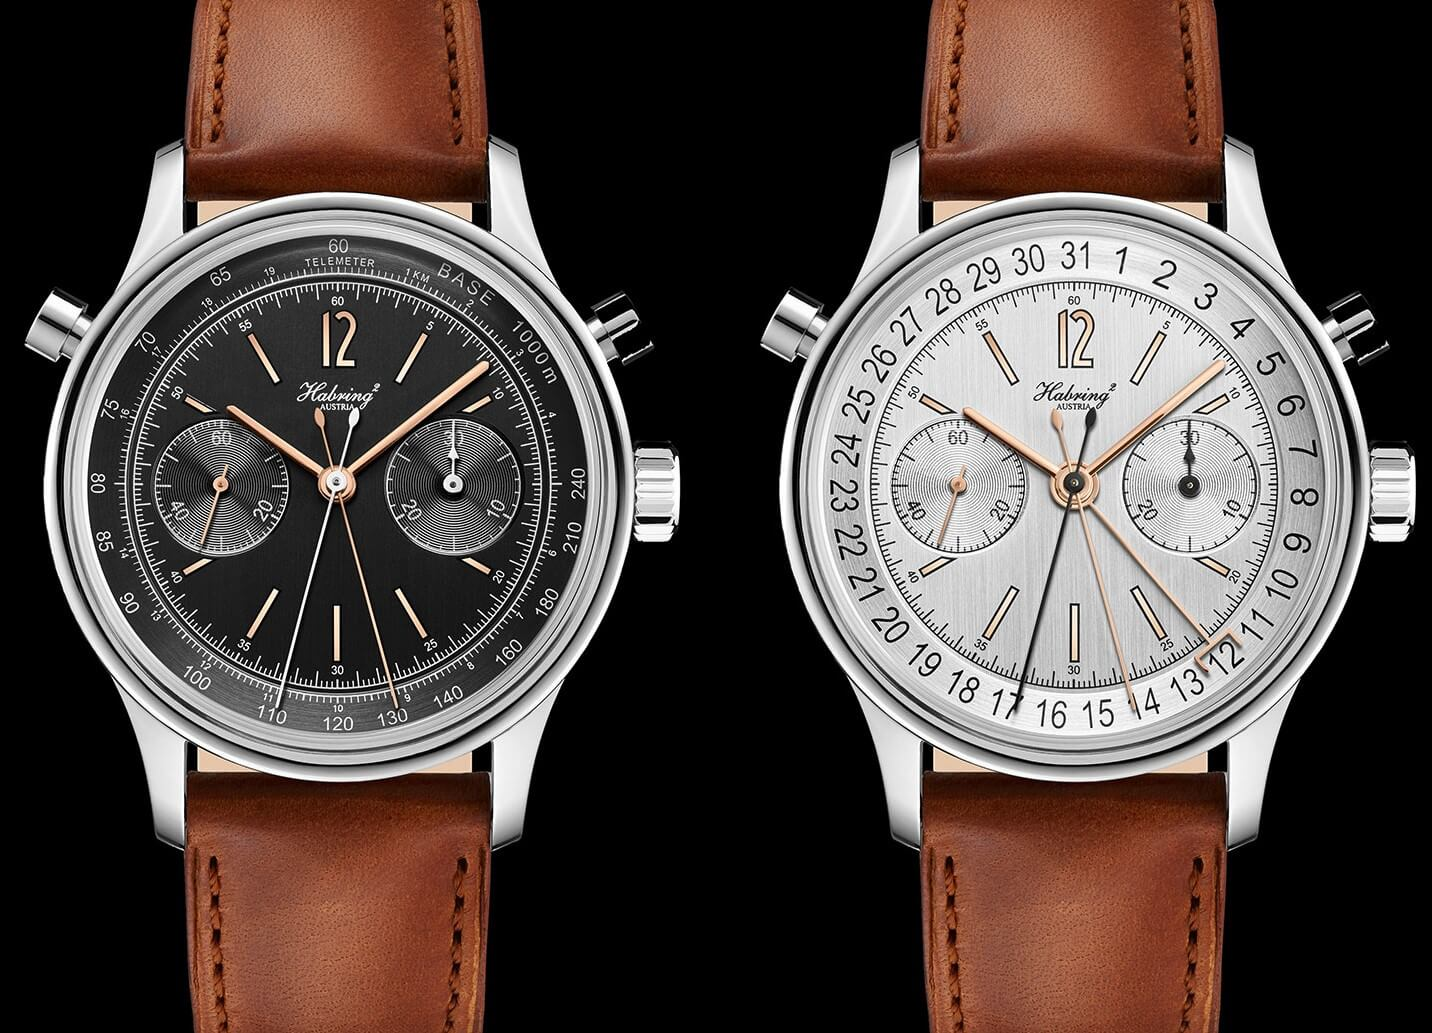 Habring2 Doppel Felix Chronograph Wristwatch